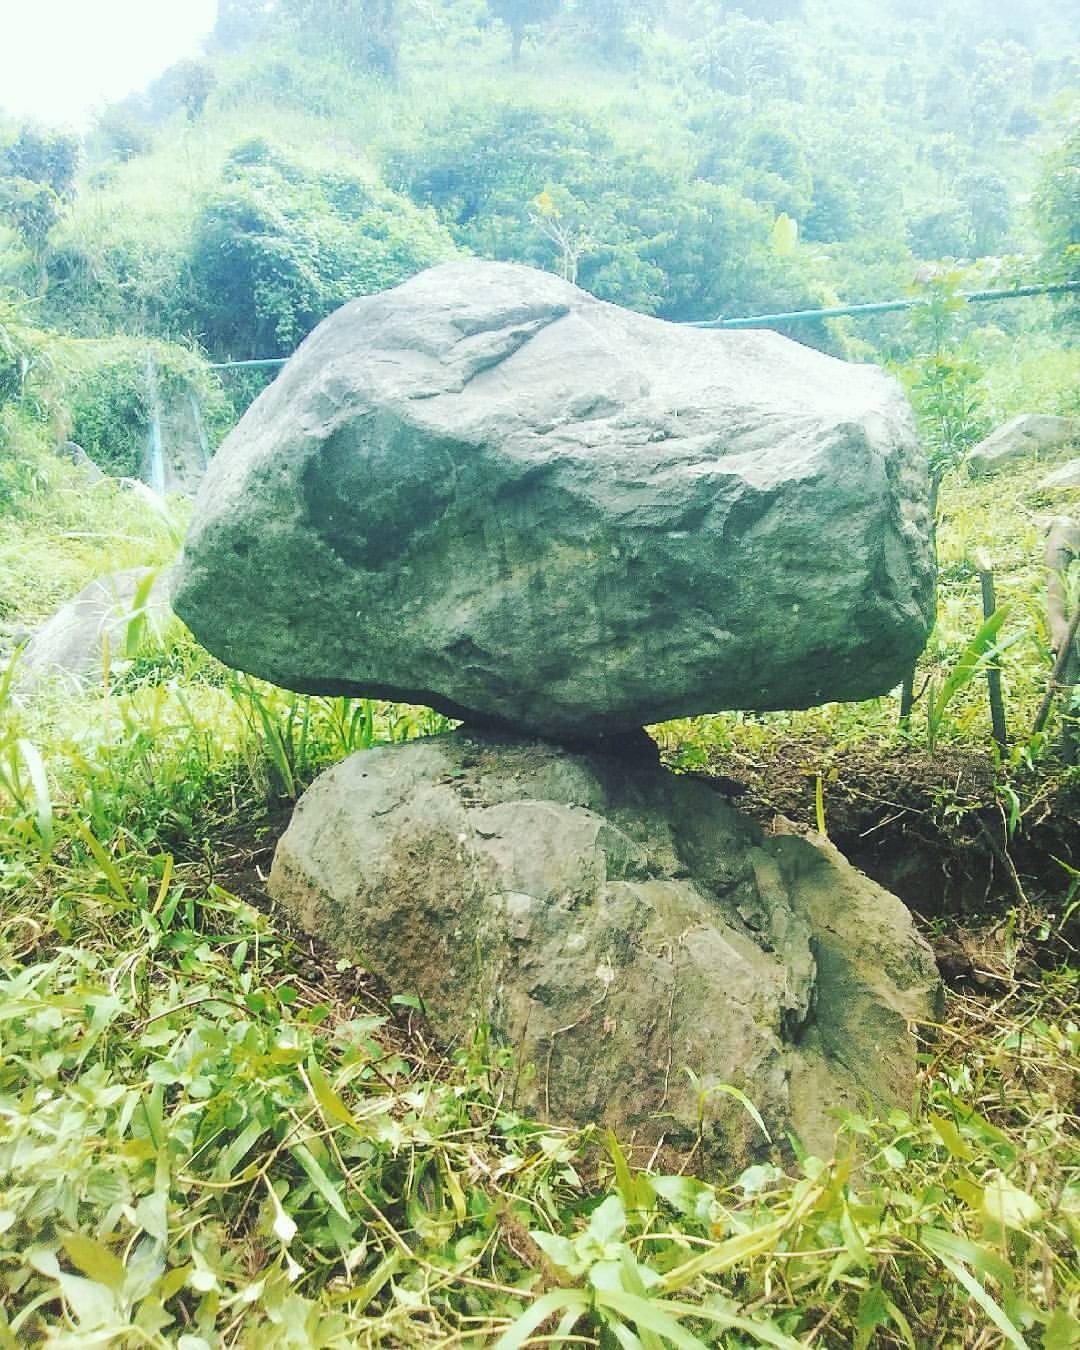 Indonesia Megalitik Megalitikum Instagram Photos Media Repost Wisataalampatiranabondowoso Amazing Stone